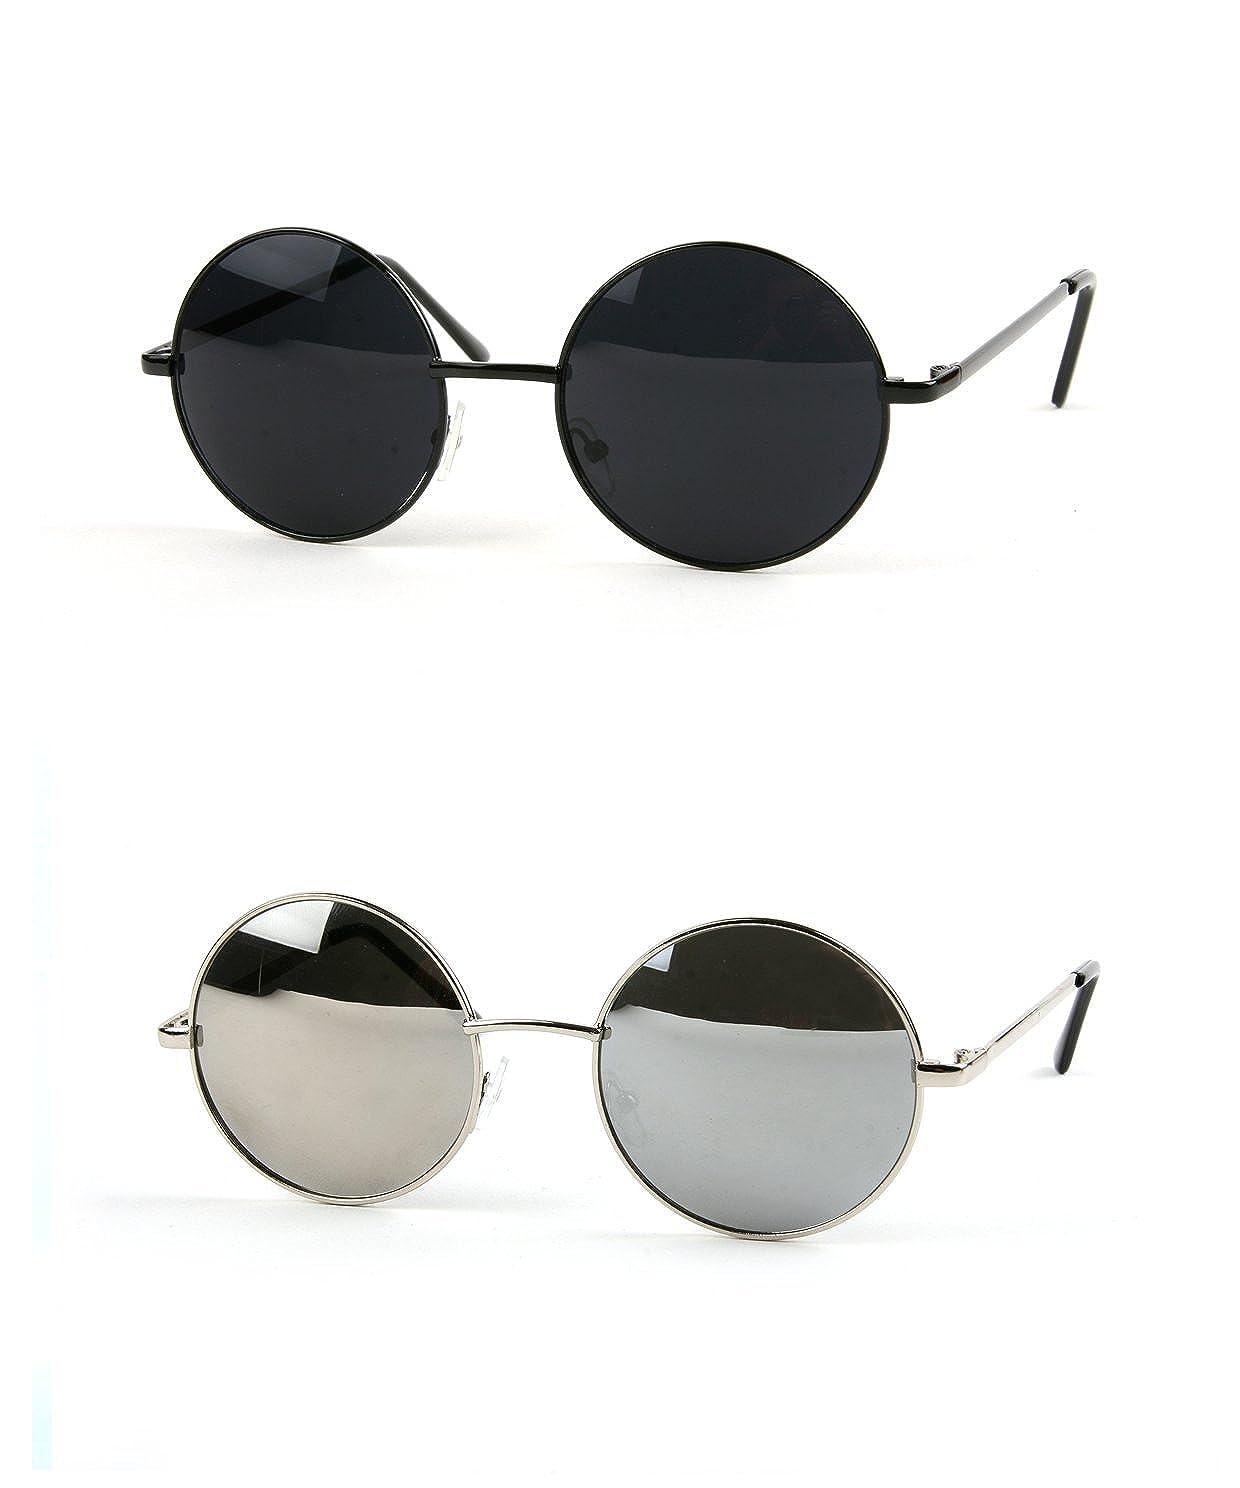 c9a14846c0c Amazon.com  John Lennon 60 s Vintage Round Hippie Sunglasses (2 pcs Black- Smoke   Gold-BlueMirror)  Clothing